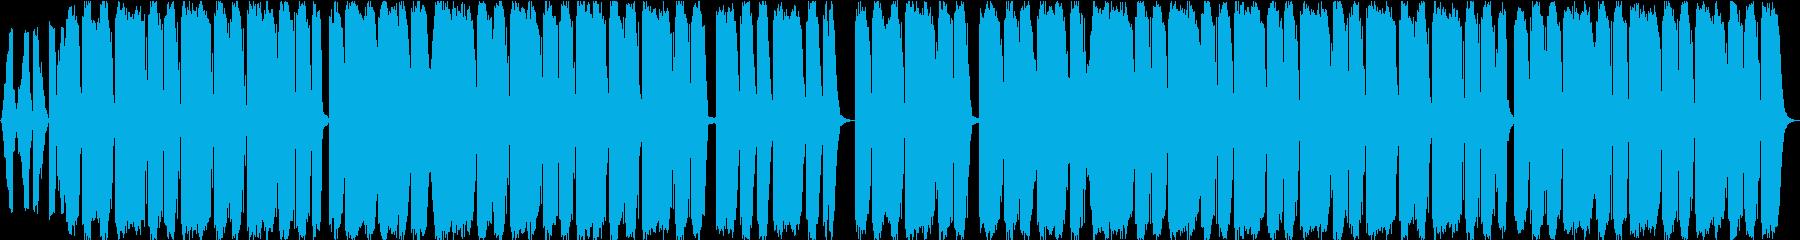 R&B系トラップビートの再生済みの波形